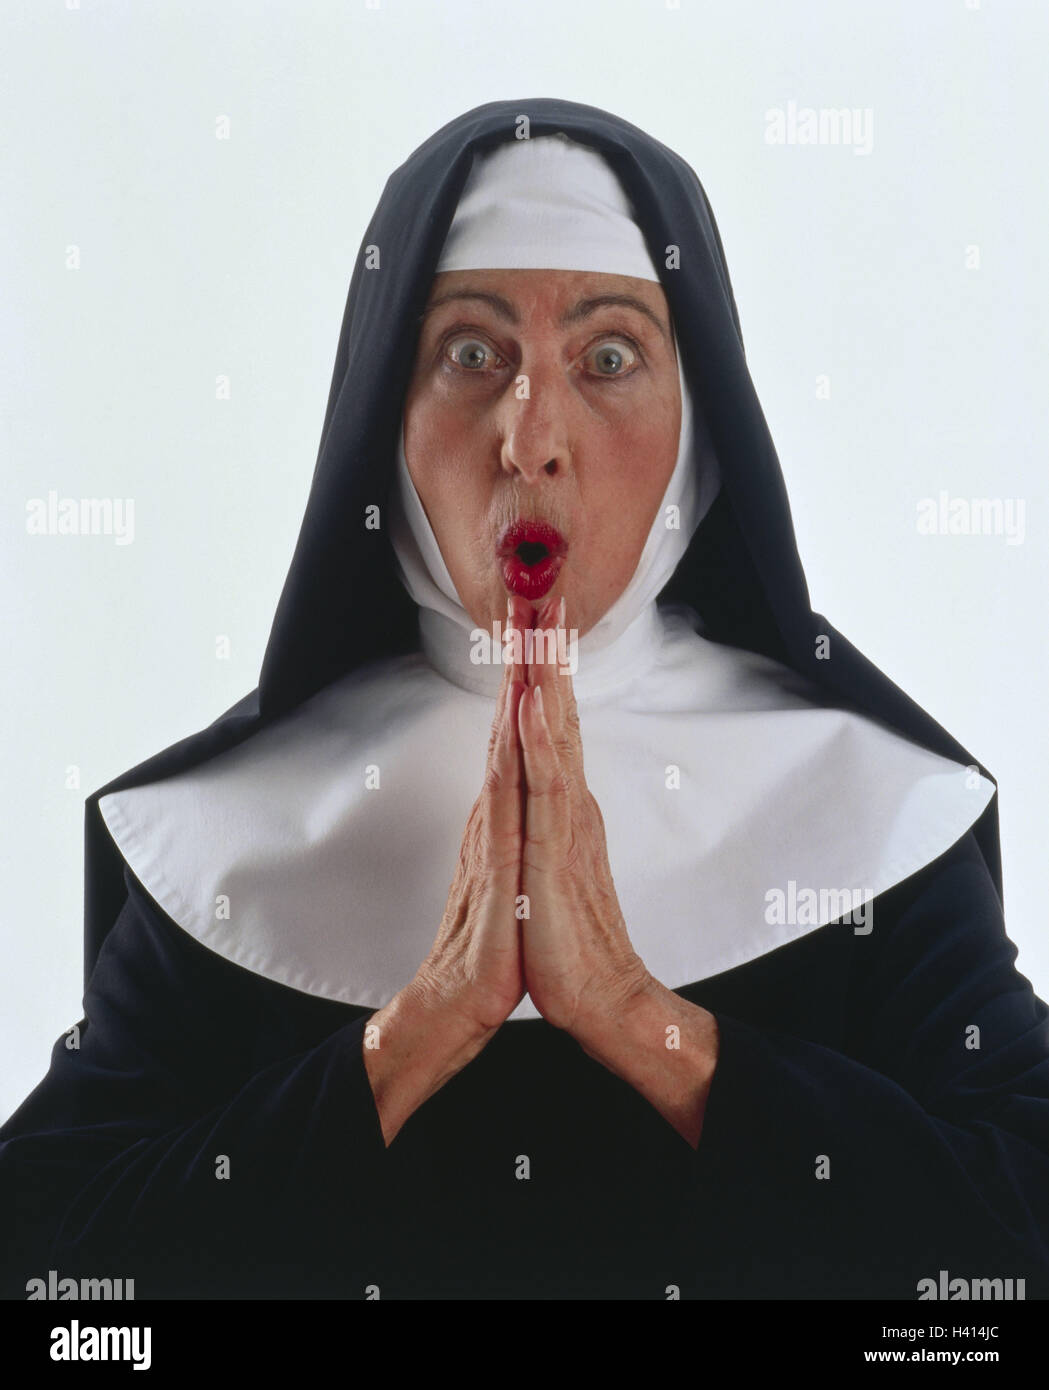 Benedictine, nun, habit, gesture, astonishment, prayer, half portrait, professions, studio, cut out, woman, habit, - Stock Image